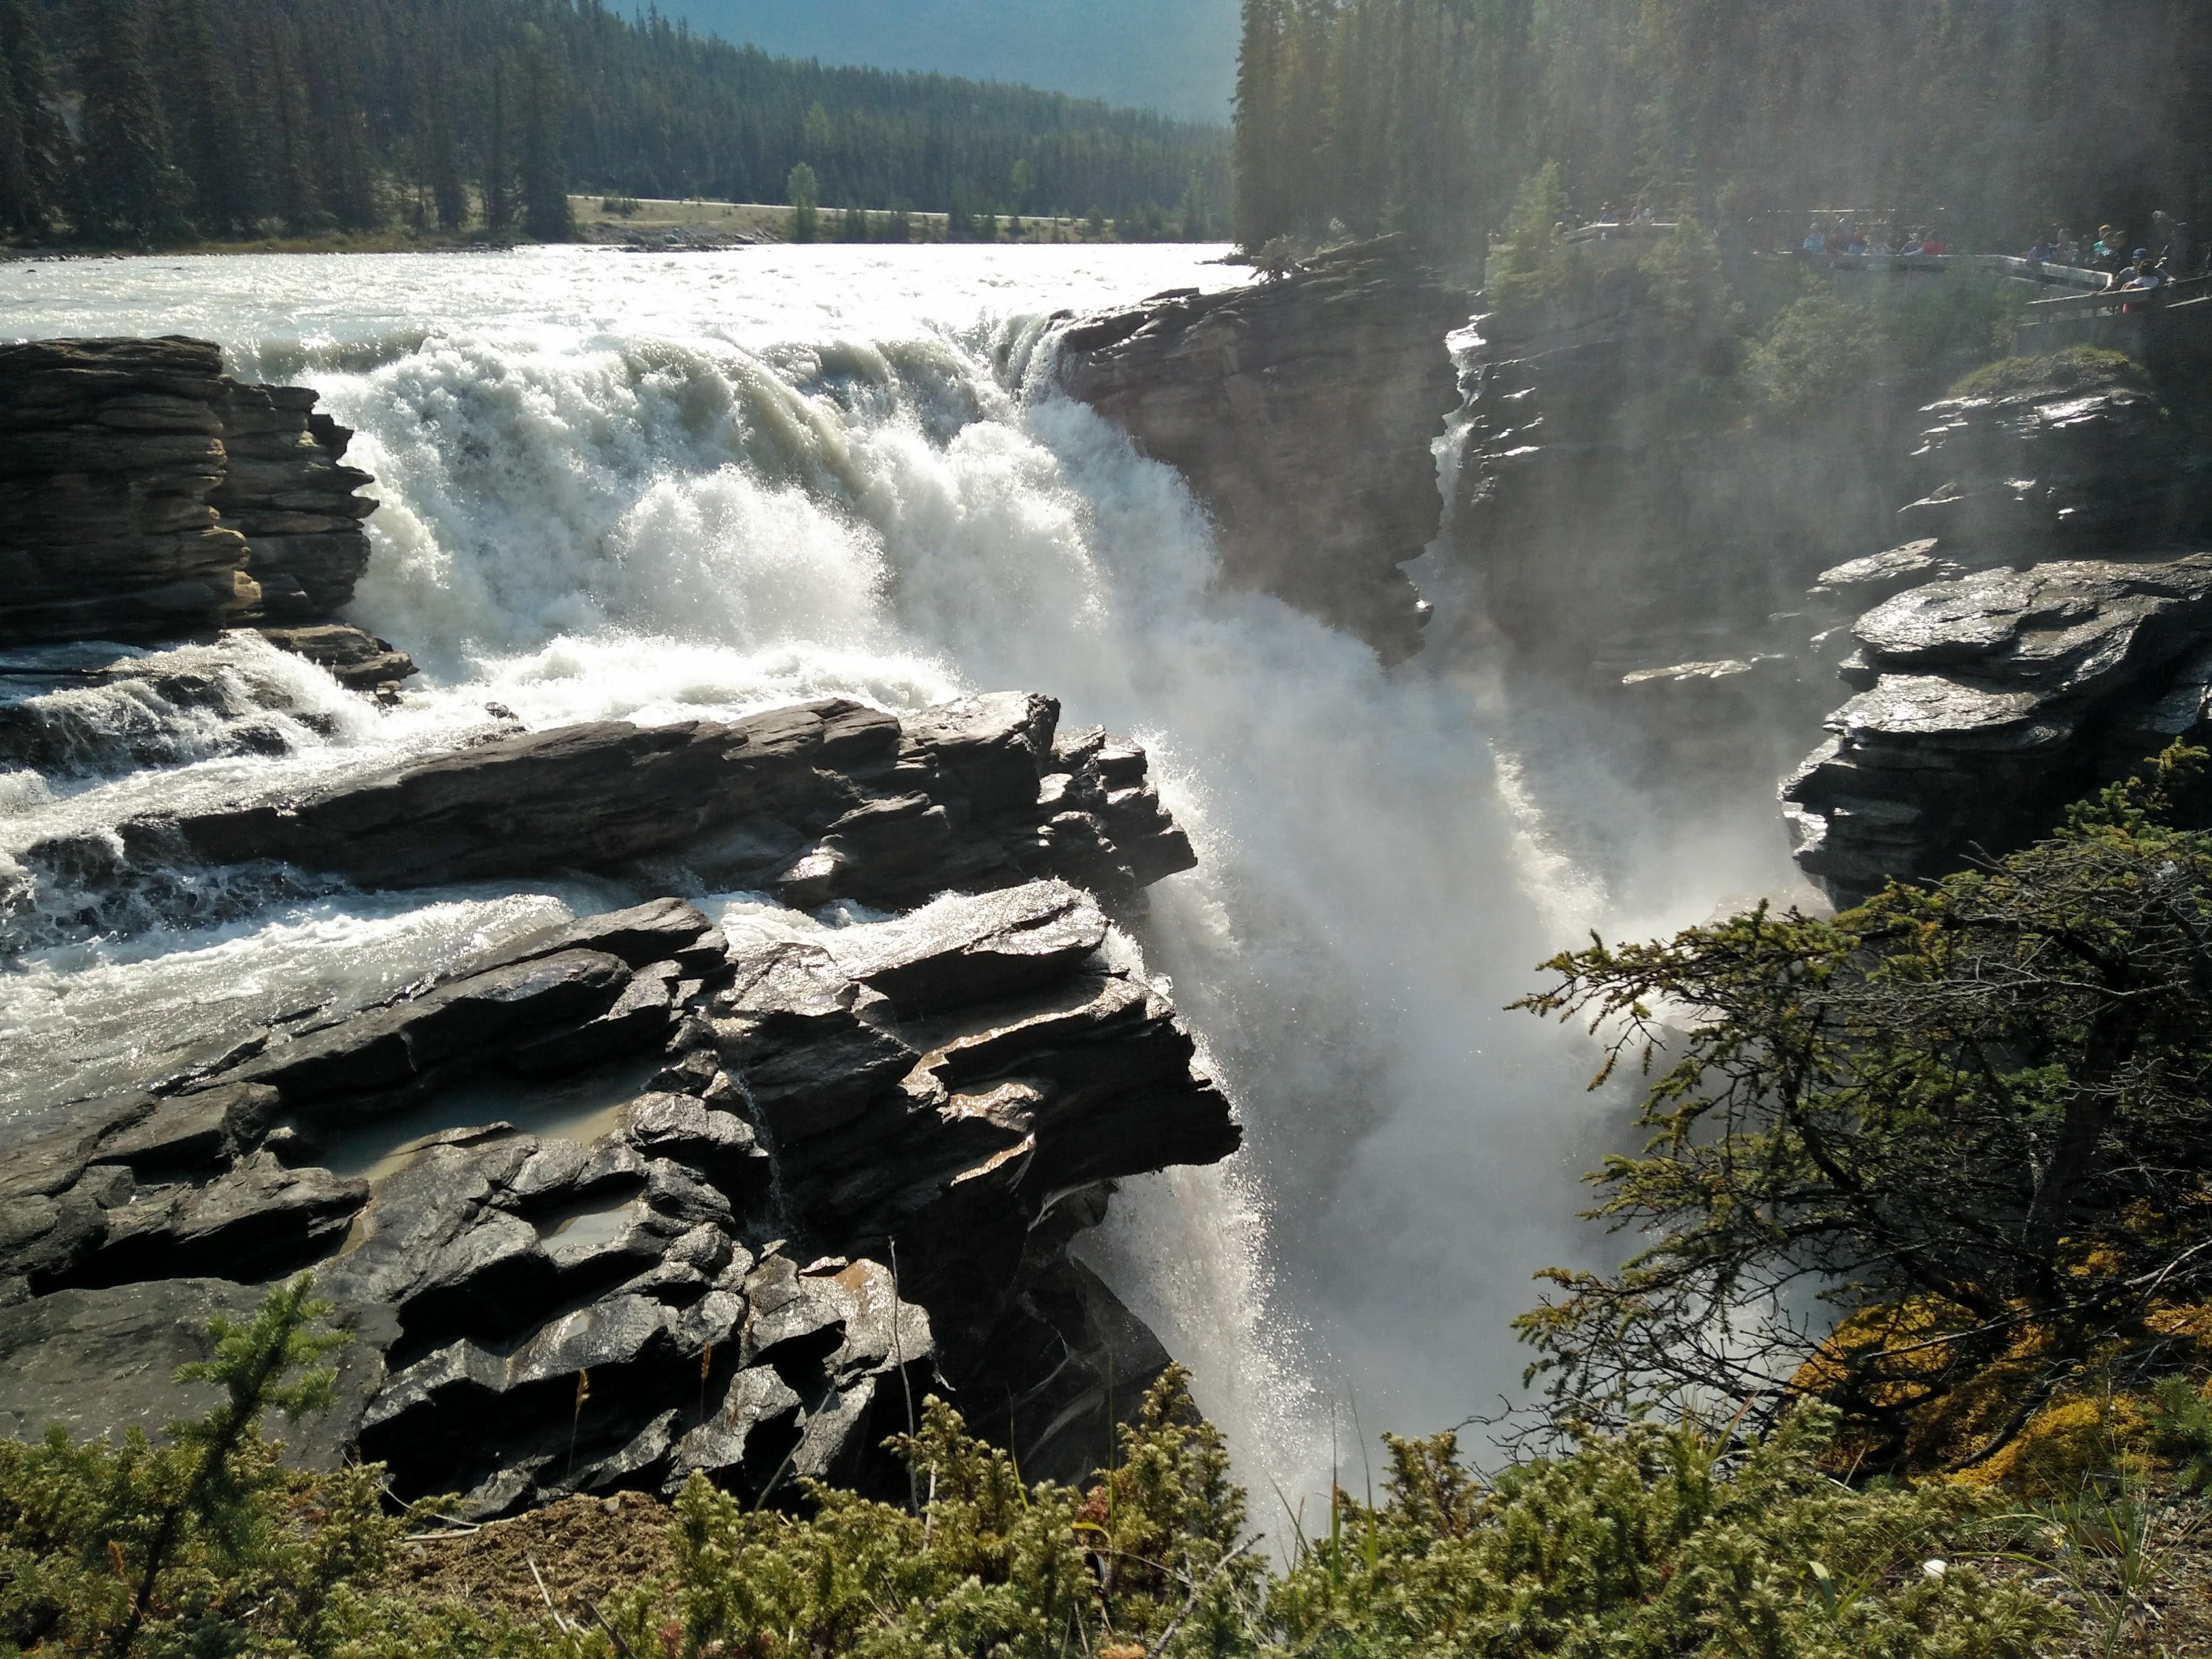 Athabasca falls jasper national park albeta canada oc